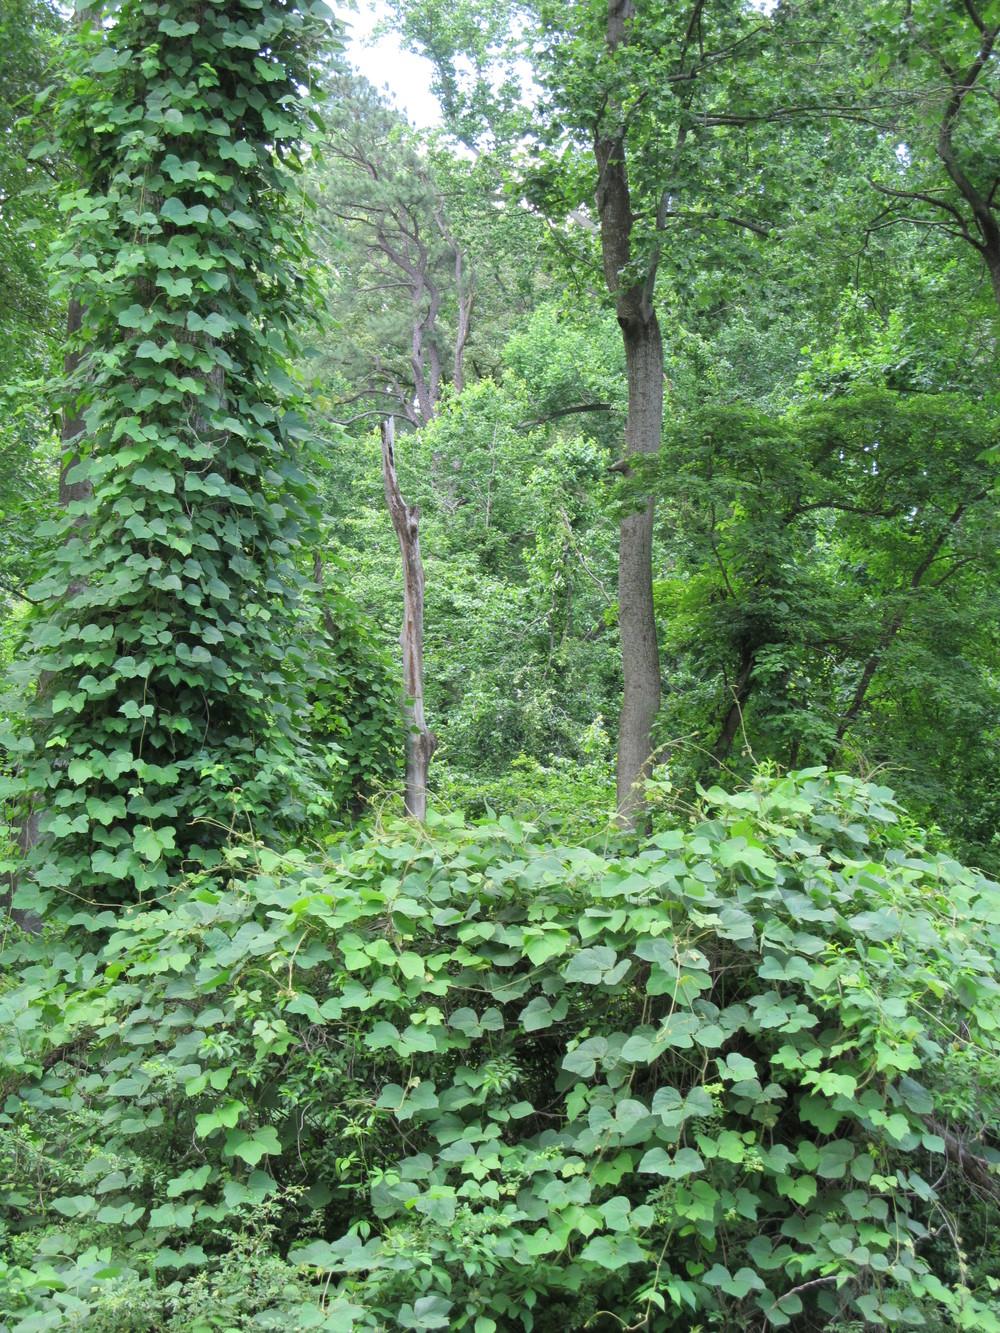 Kudzu vine Photo by: Alan Leslie, University of Maryland